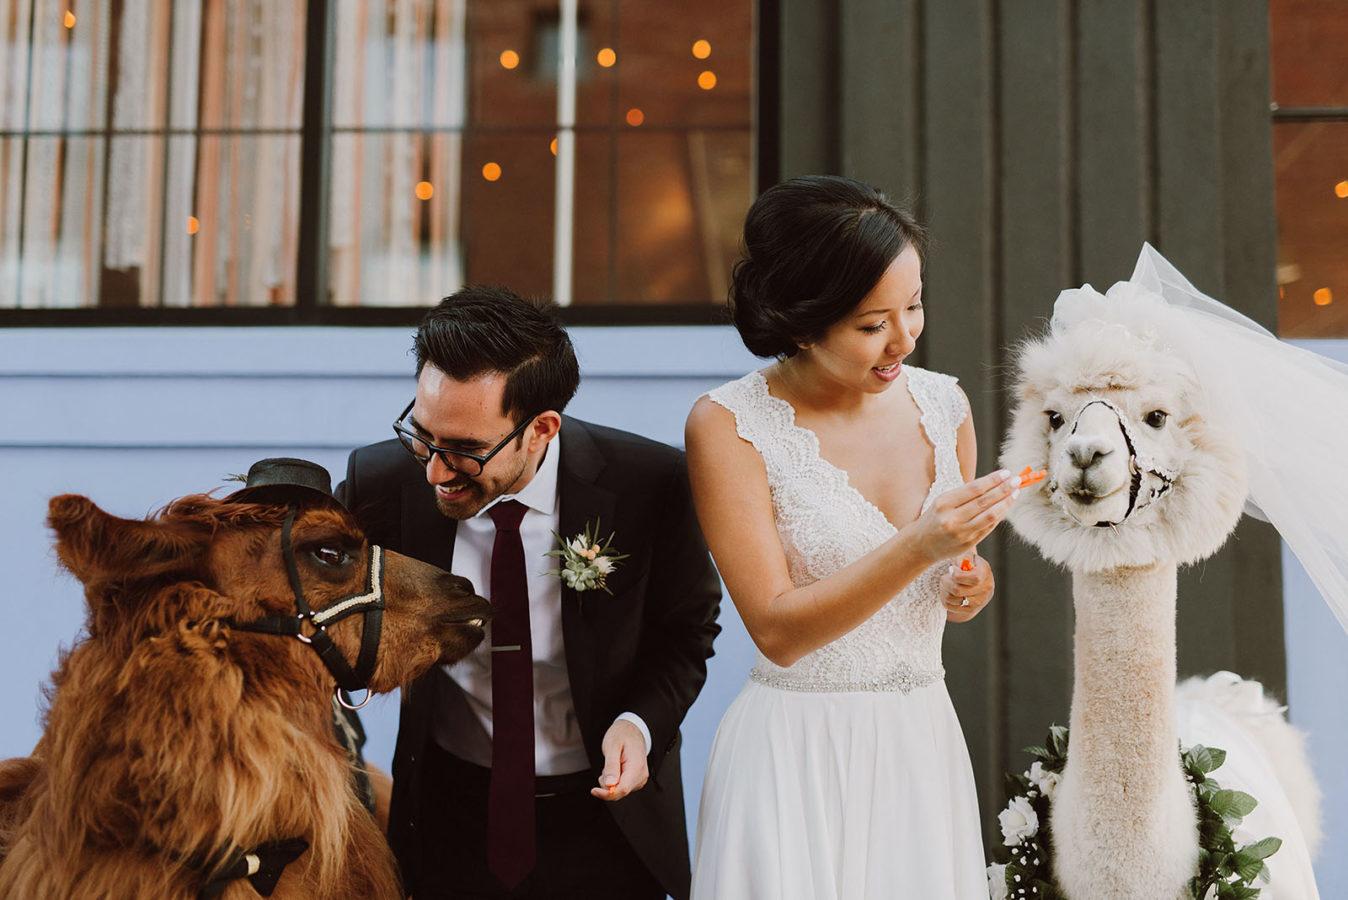 portland-castaway-wedding-kimsmithmiller-051